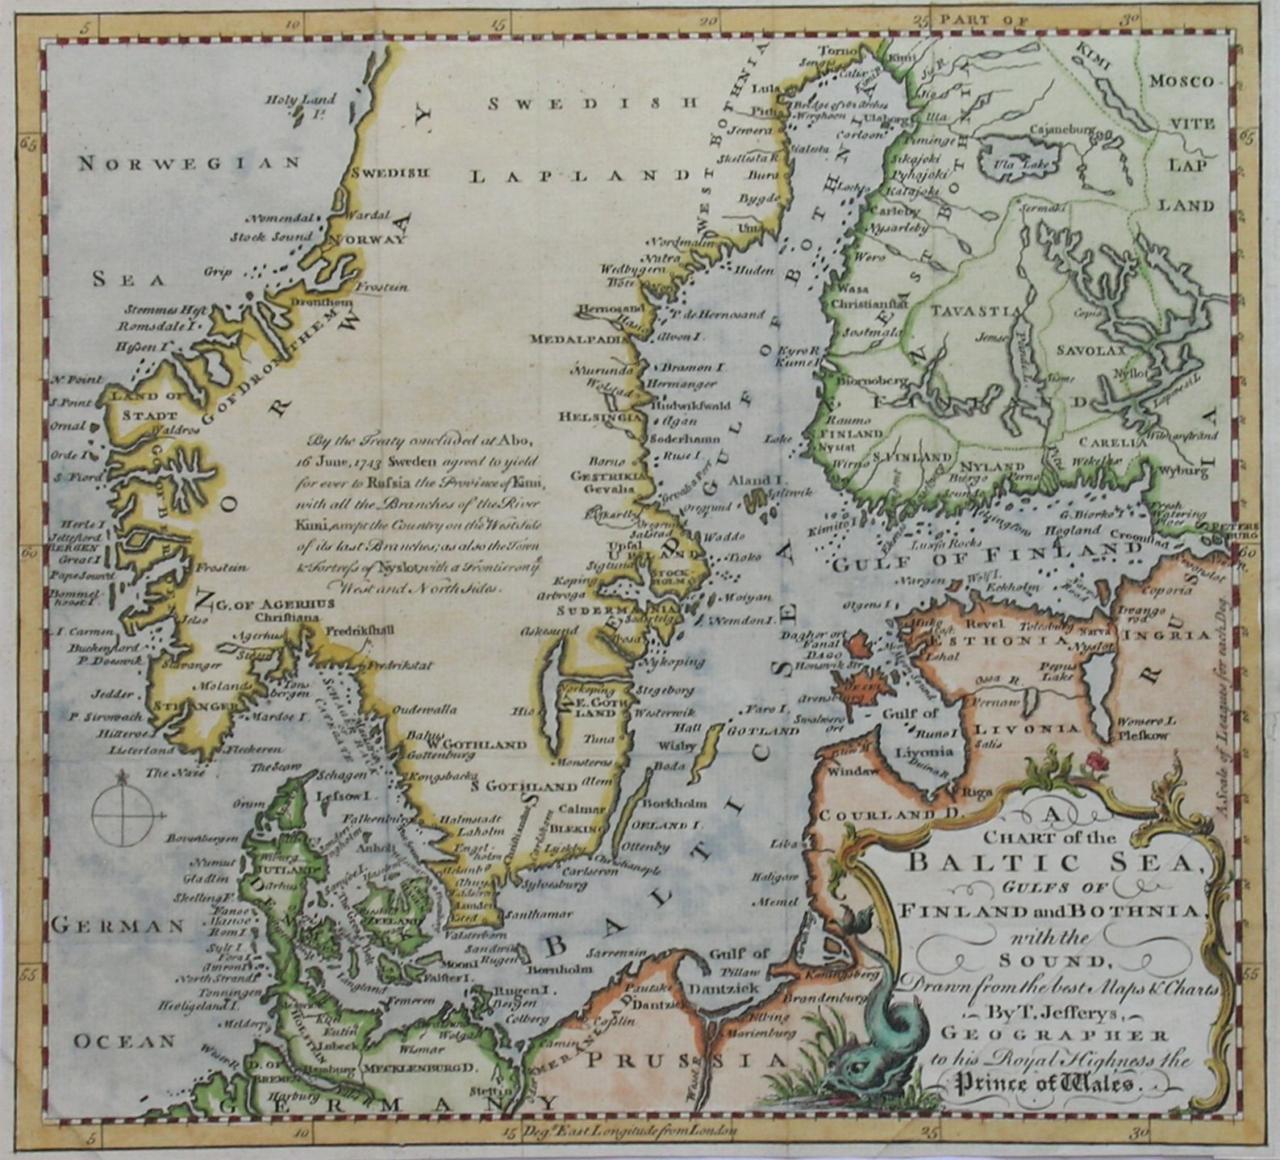 BALTIC SEA A CHART OF THE BALTIC SEA || Michael Jennings Antique ...